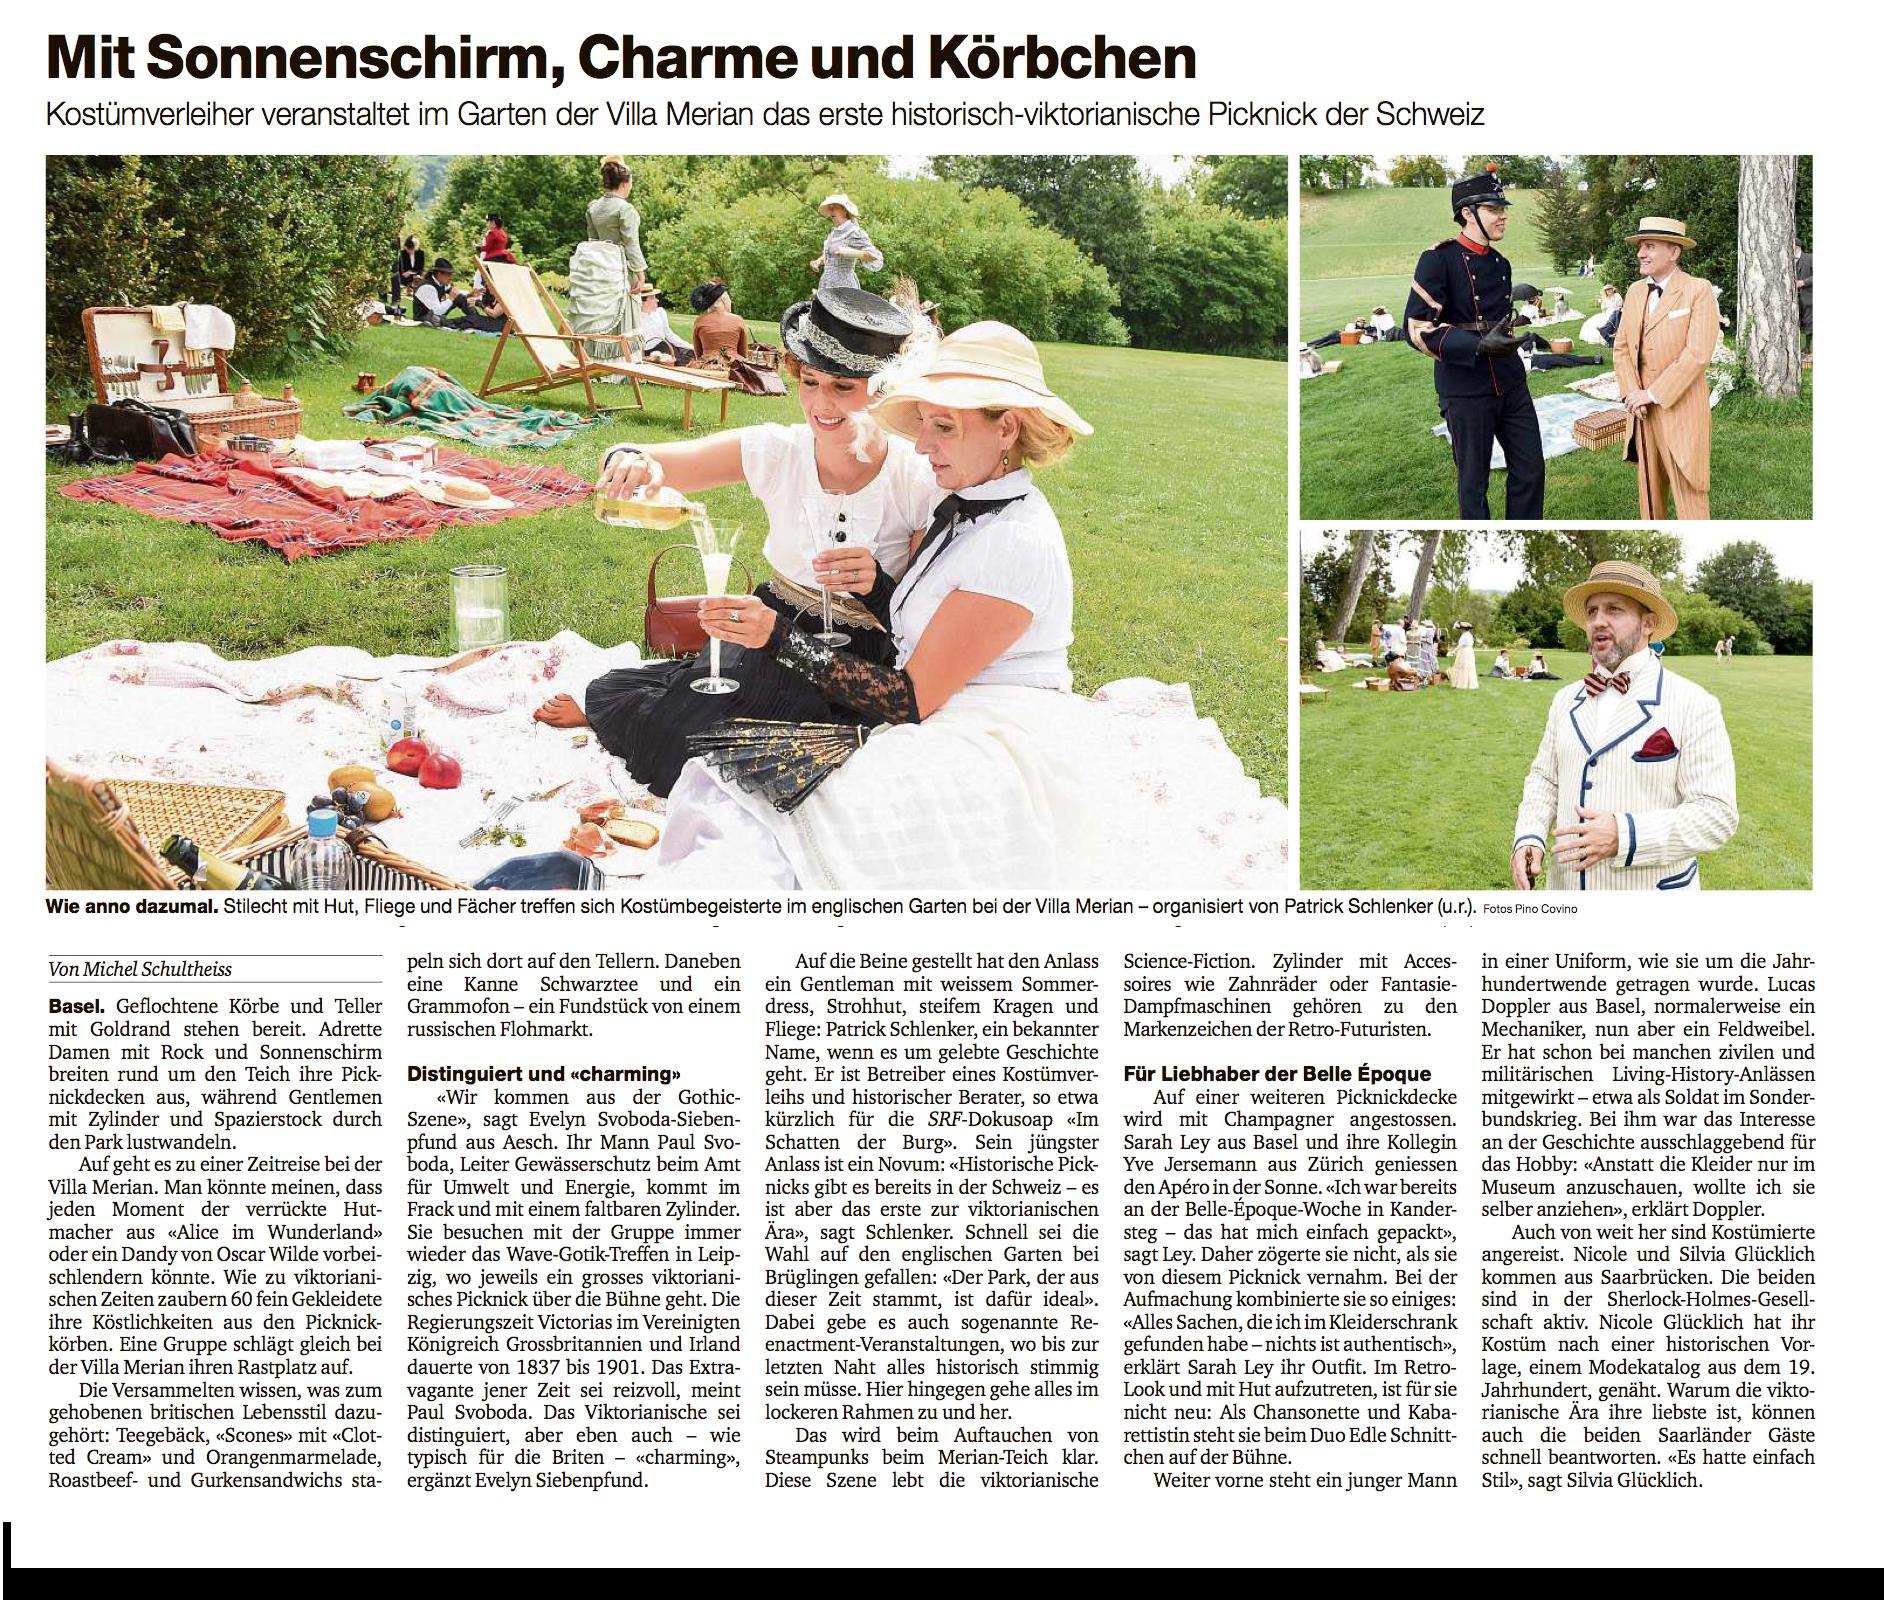 Basler Zeitung viktorianisches Picknick 2017